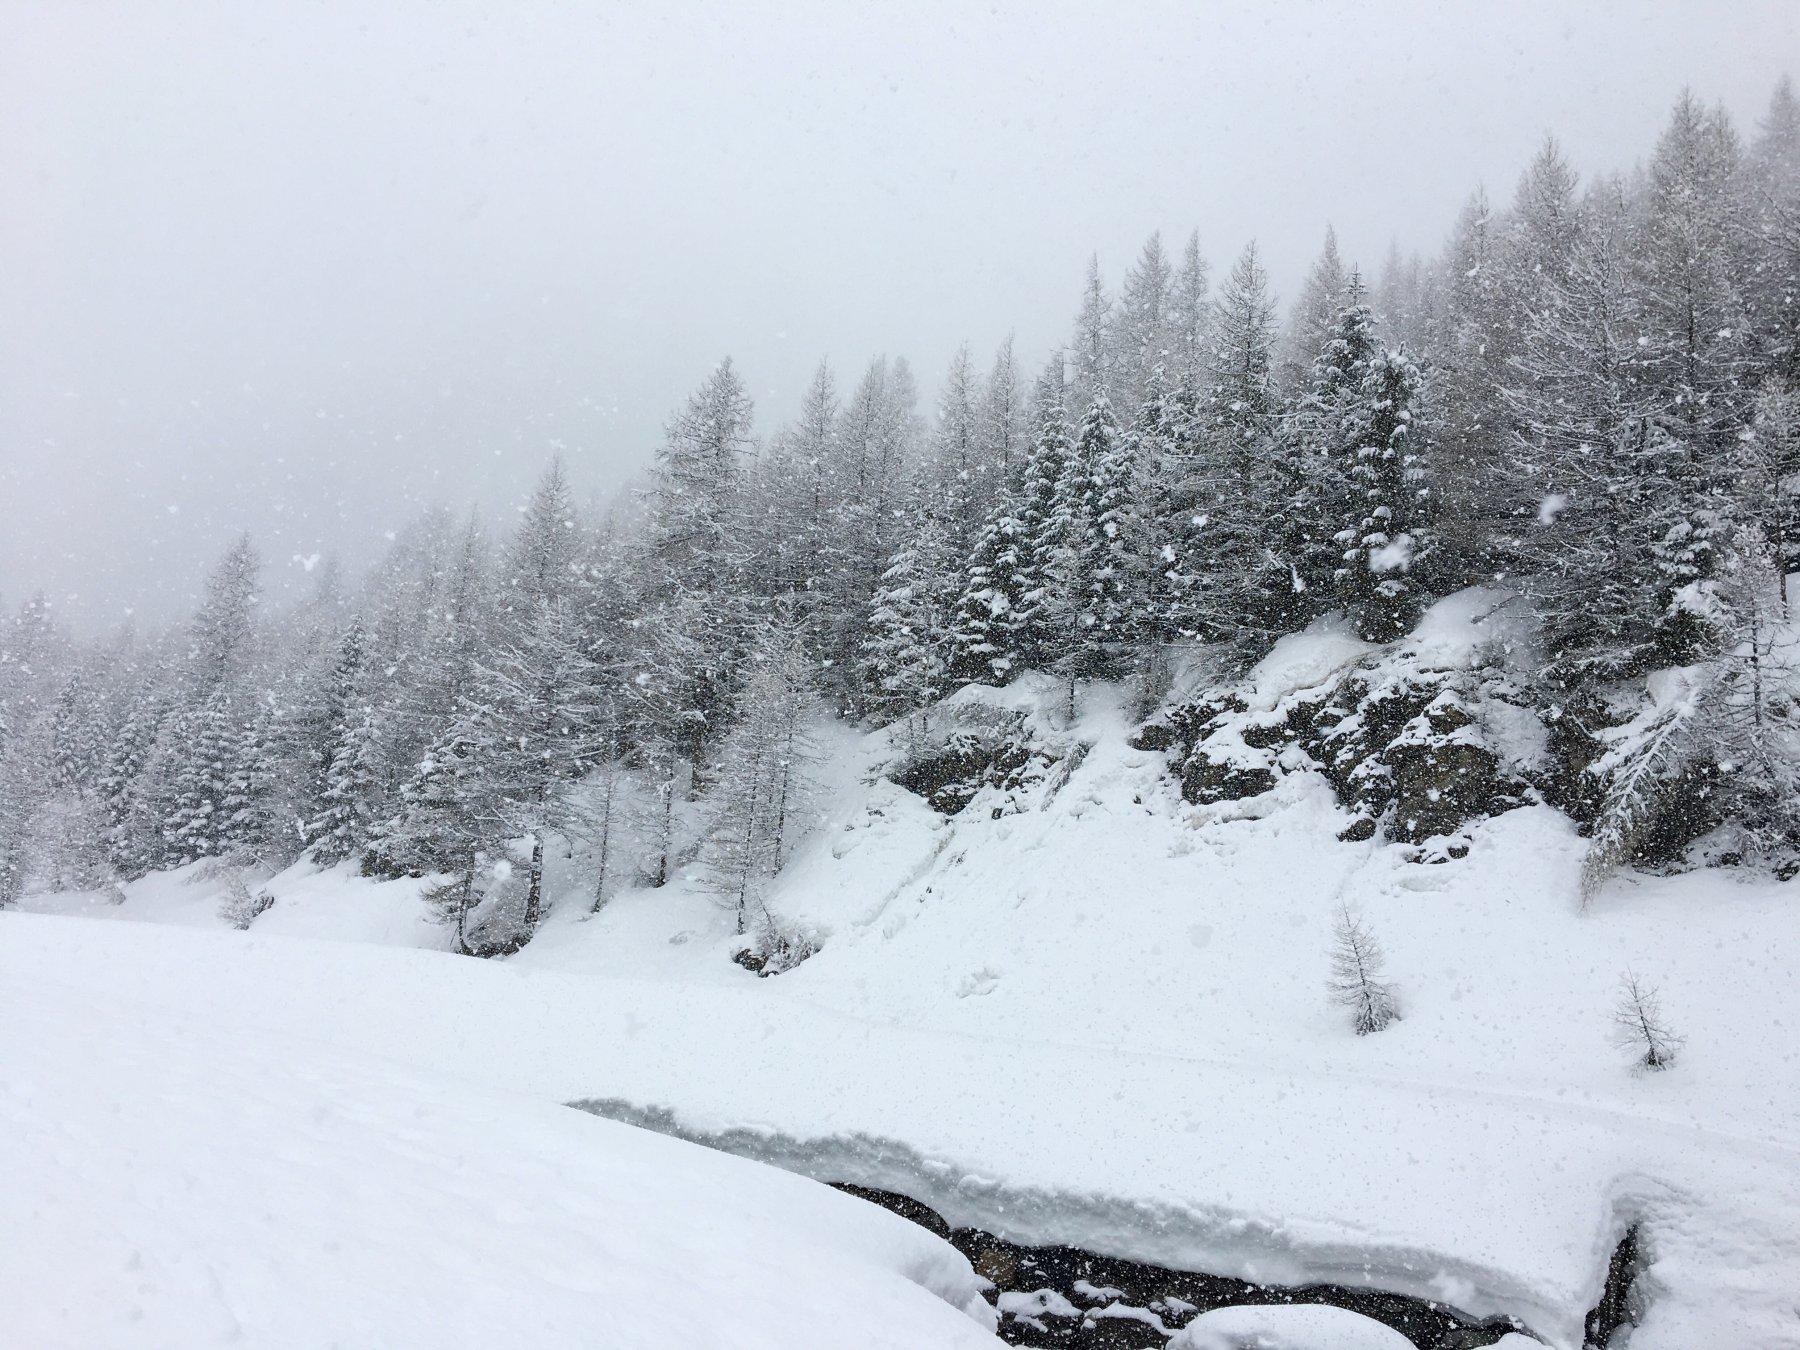 Verso Laval , ambiente invernale